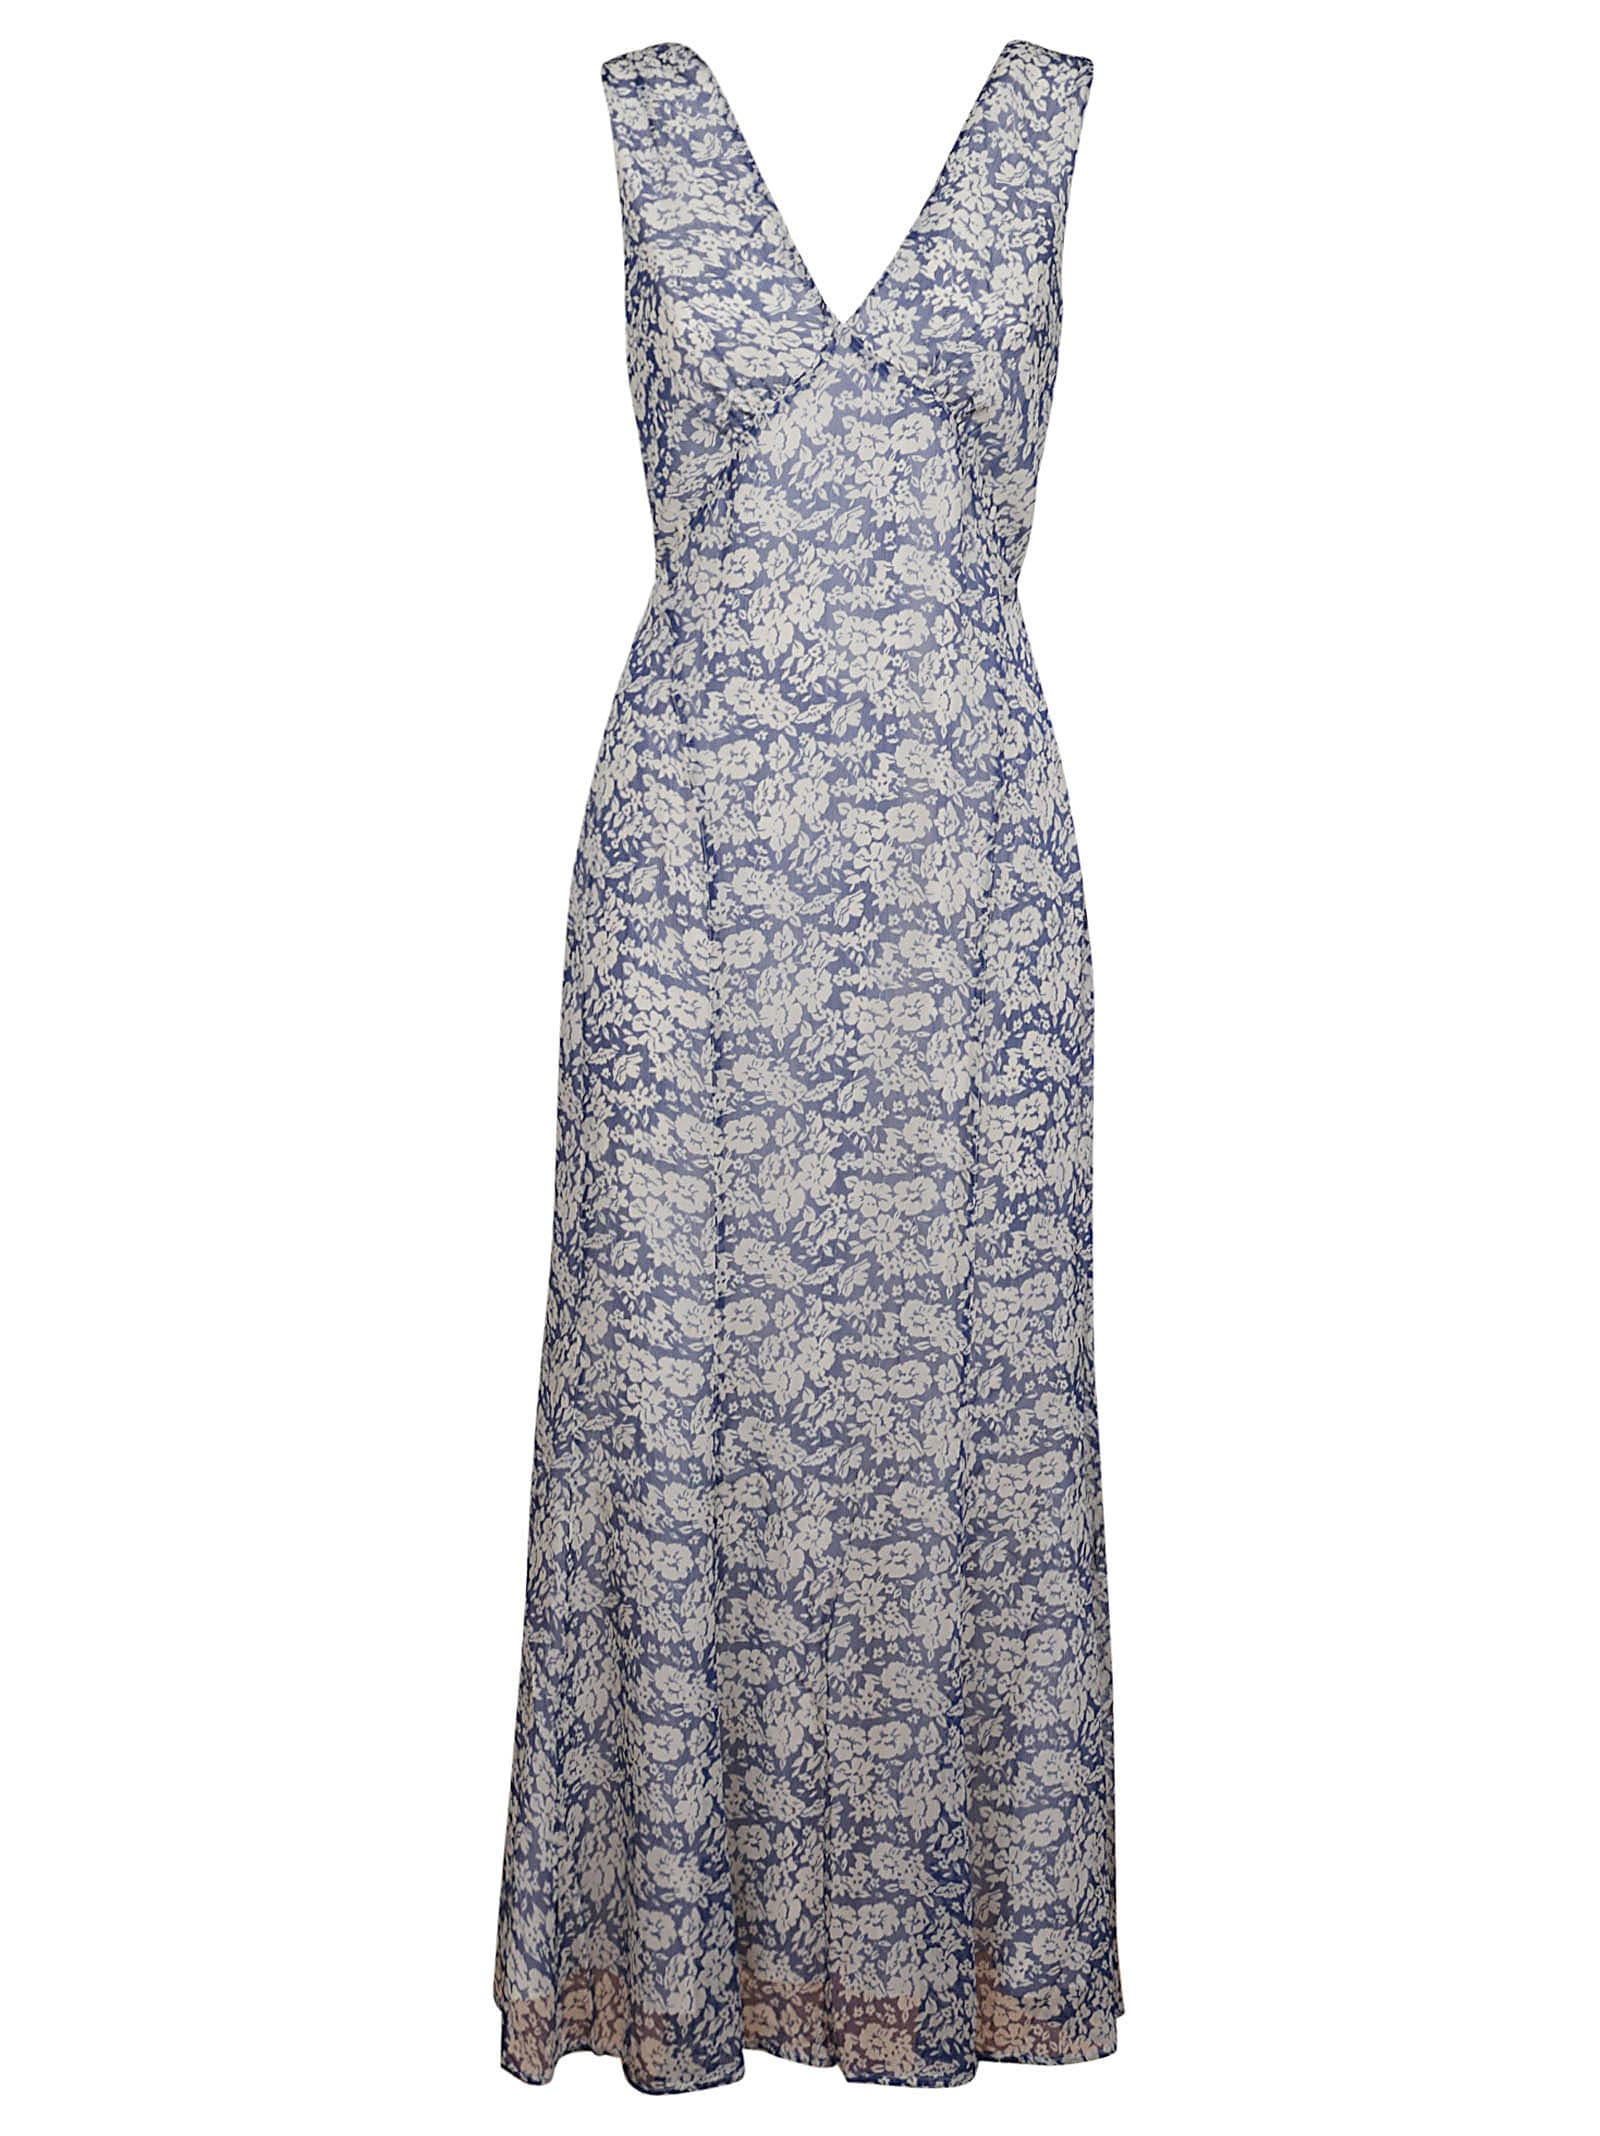 Polo Ralph Lauren Linings MULTICOLOR VISCOSE DRESS